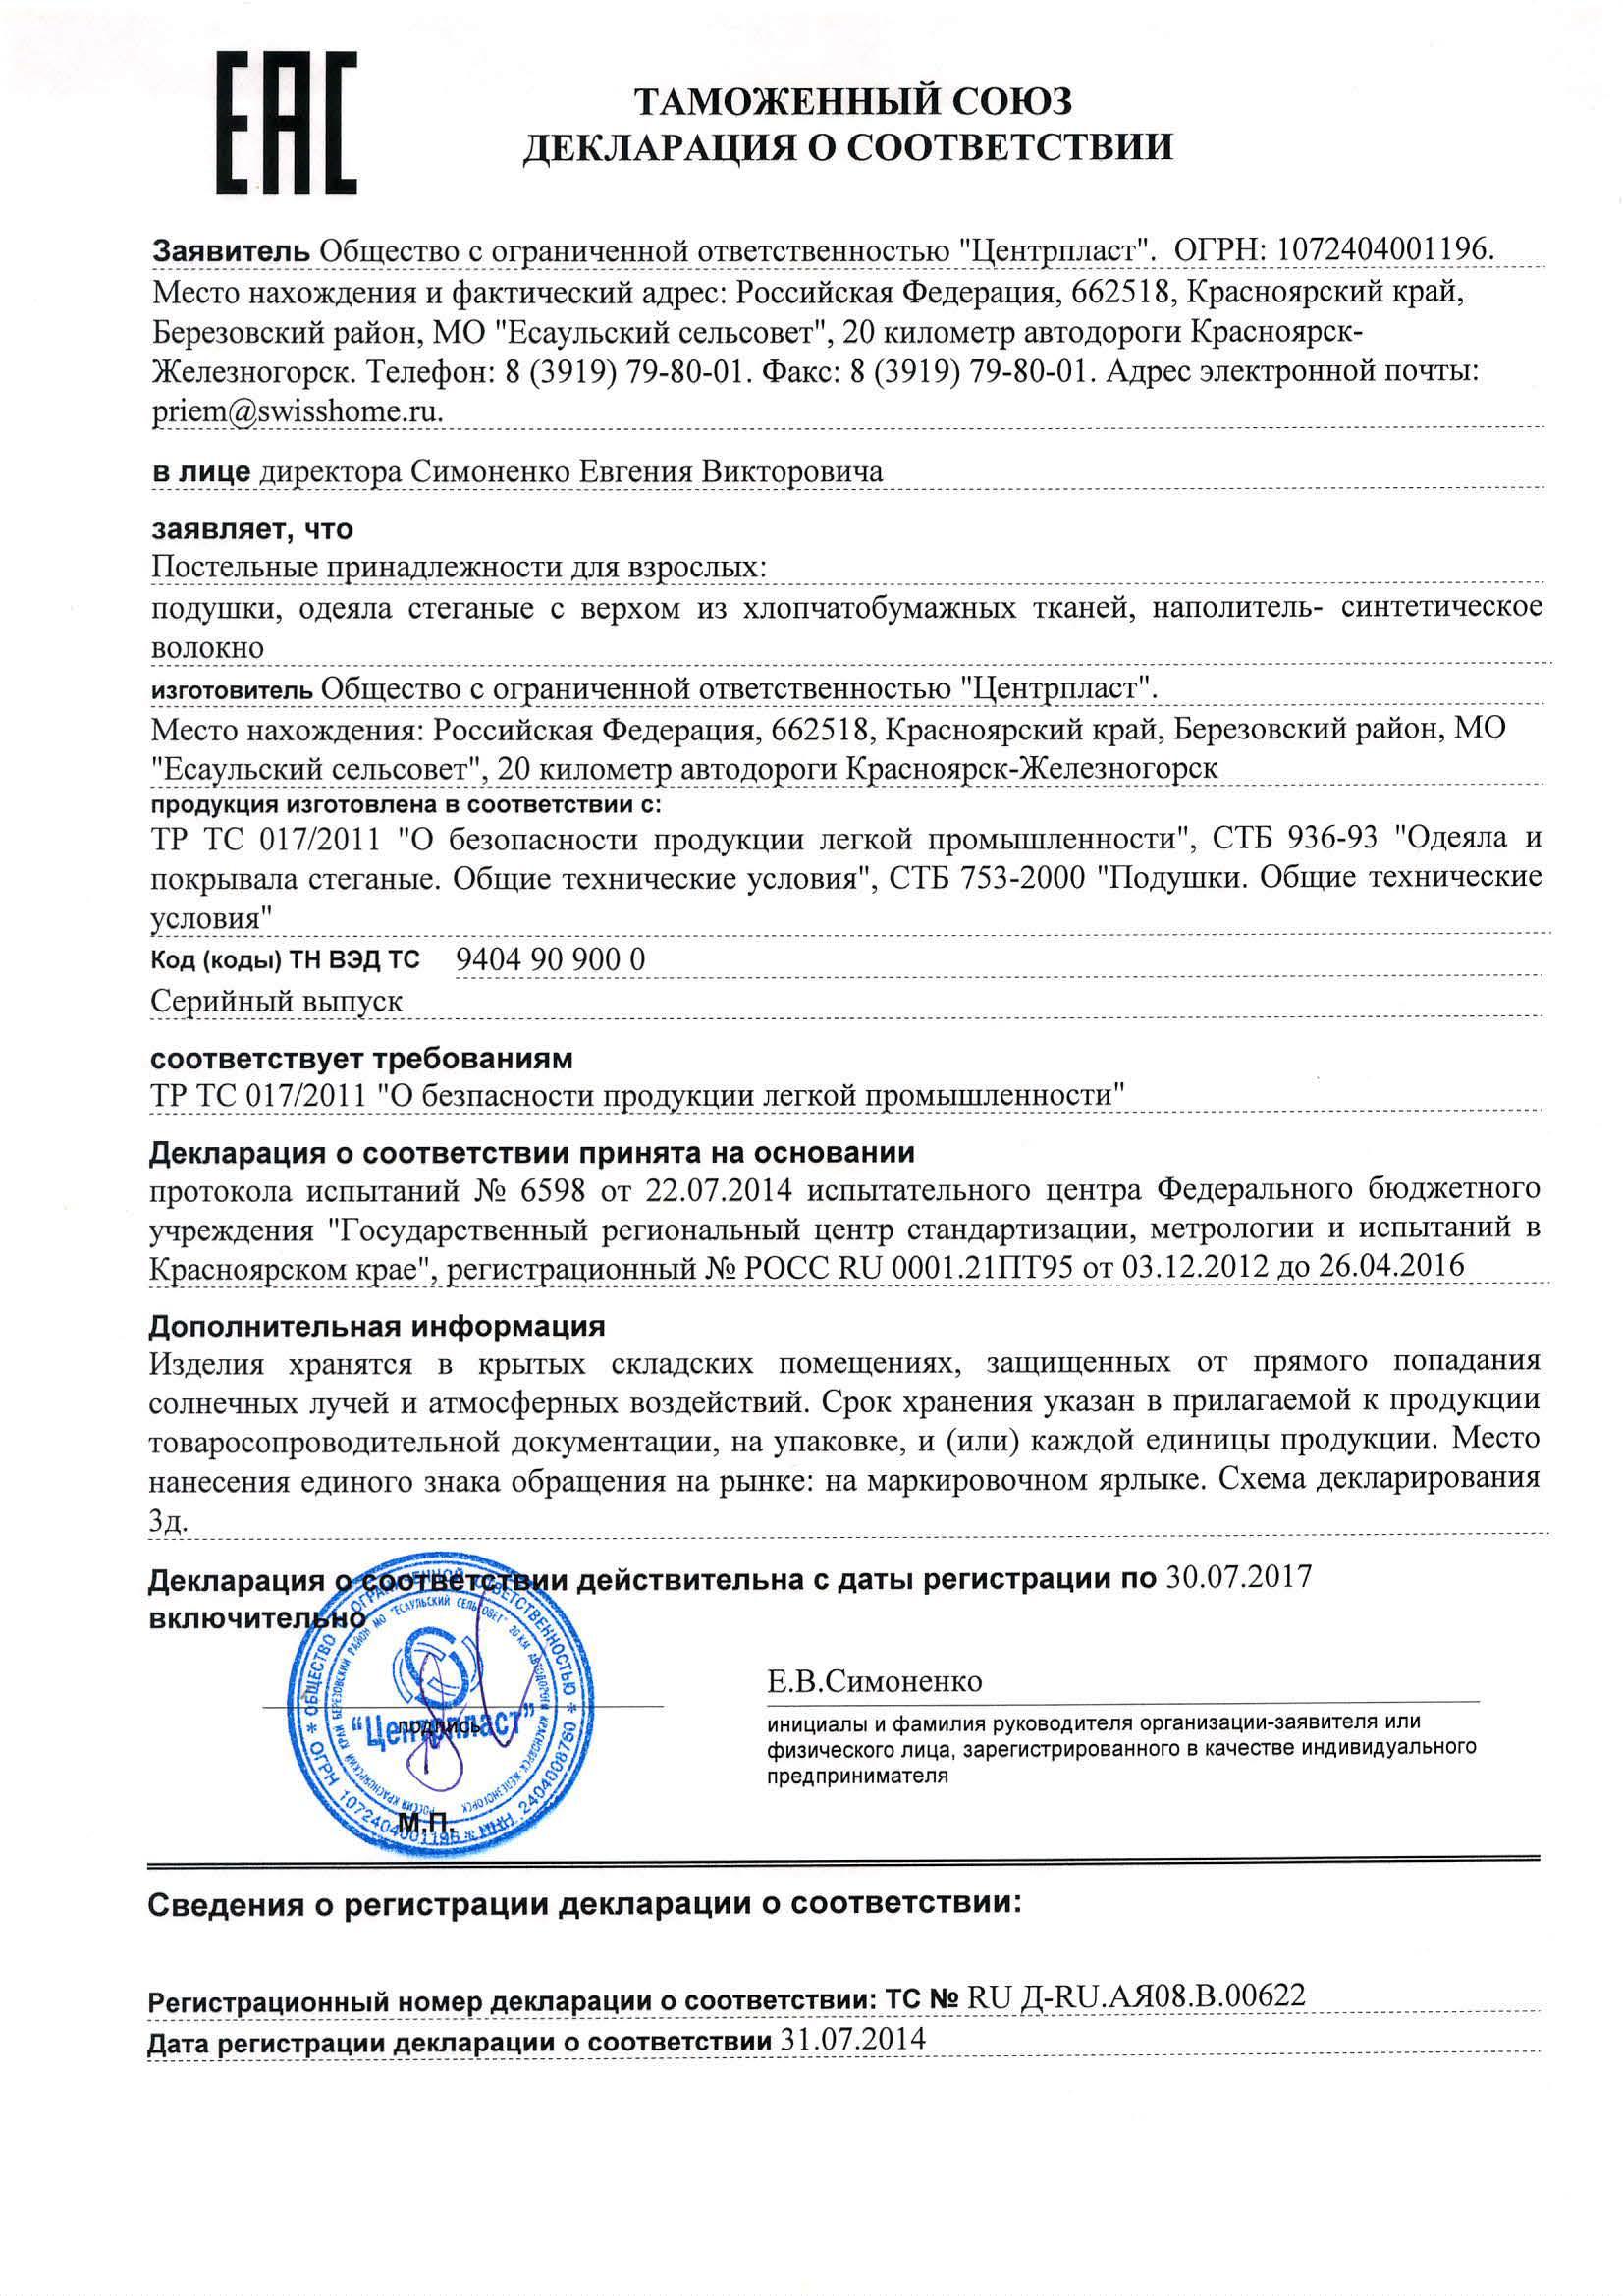 http://swisshomeshop.ru/images/upload/ЕАС%20%20ВЗРОСЛЫЕ%20ПОДУШКИ%20И%20ОДЕЯЛА.jpg